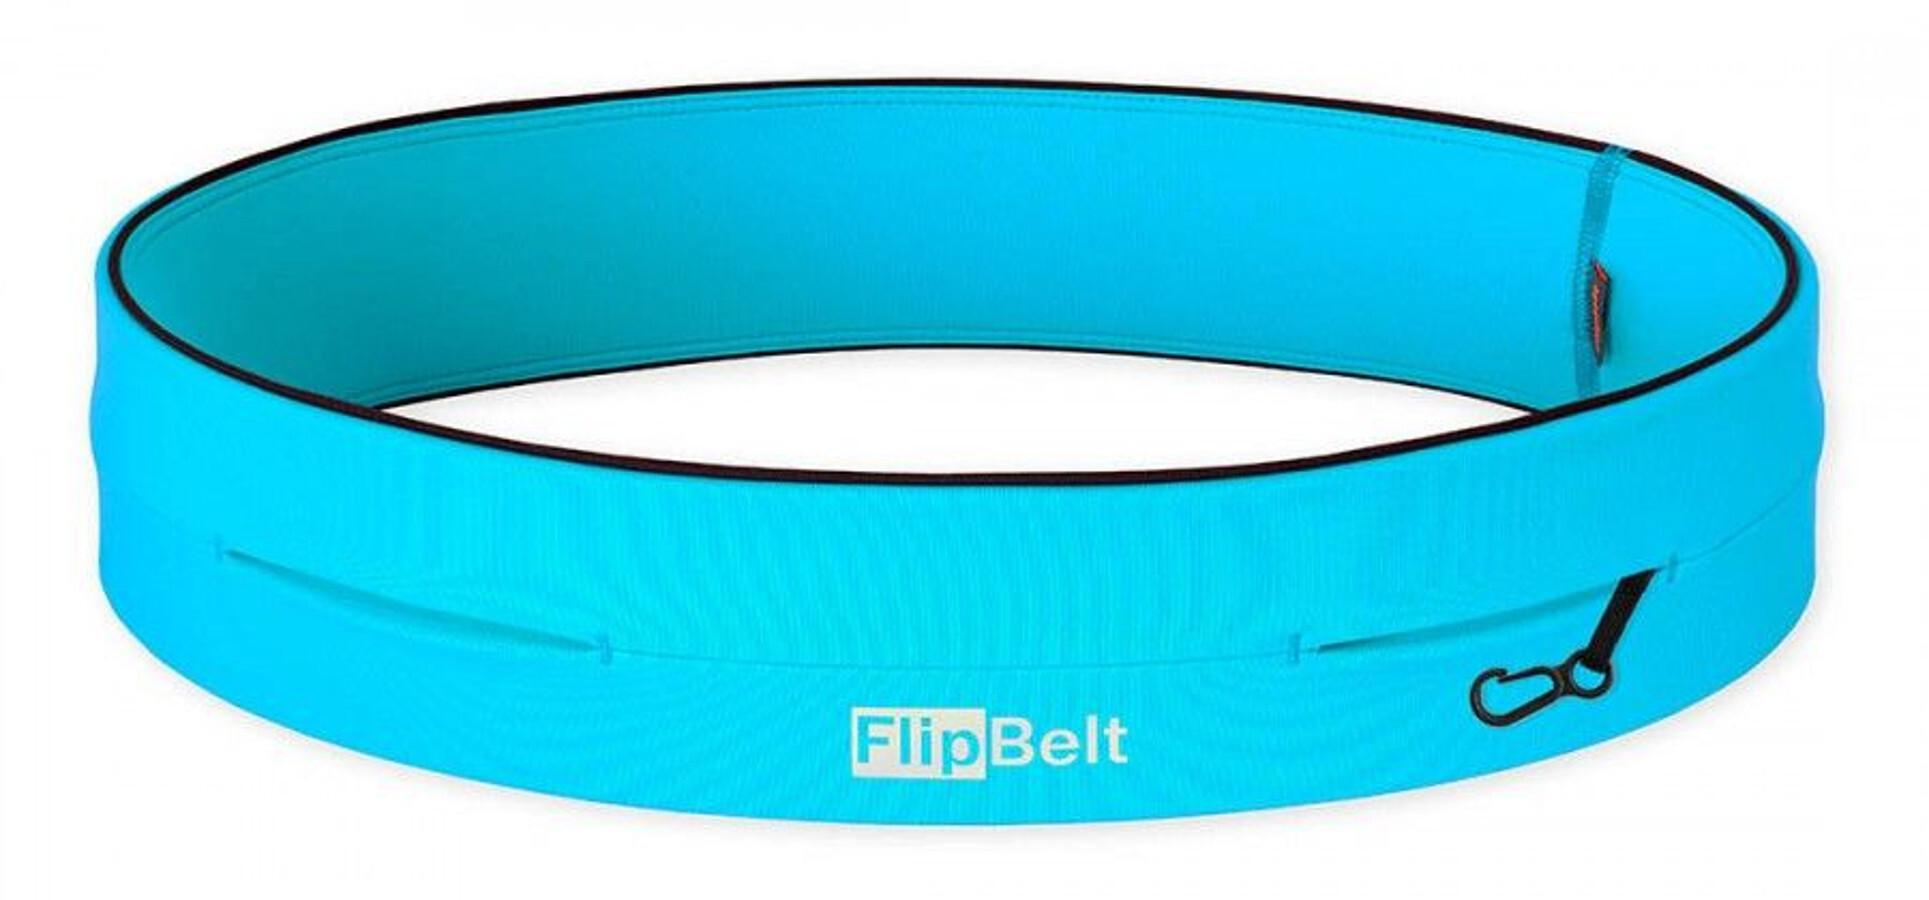 FlipBelt Classic Fitnessbælte, aqua | Andet beklædning